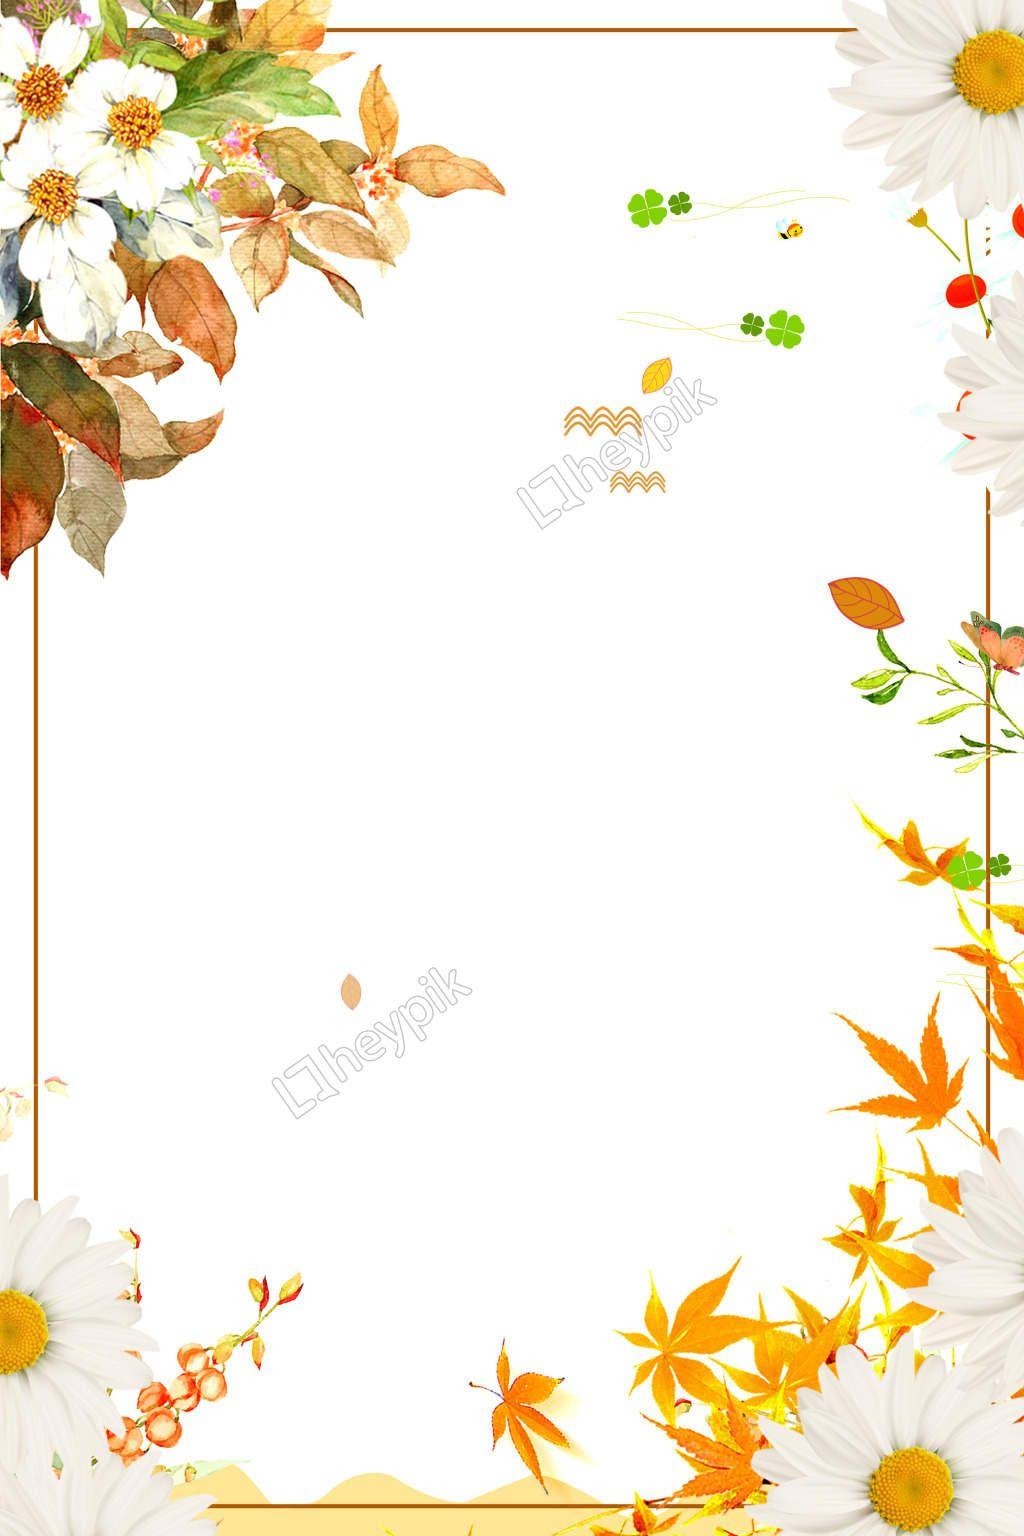 Romantic Golden Autumn Border Background Flower Frame Backgrounds Free Romantic